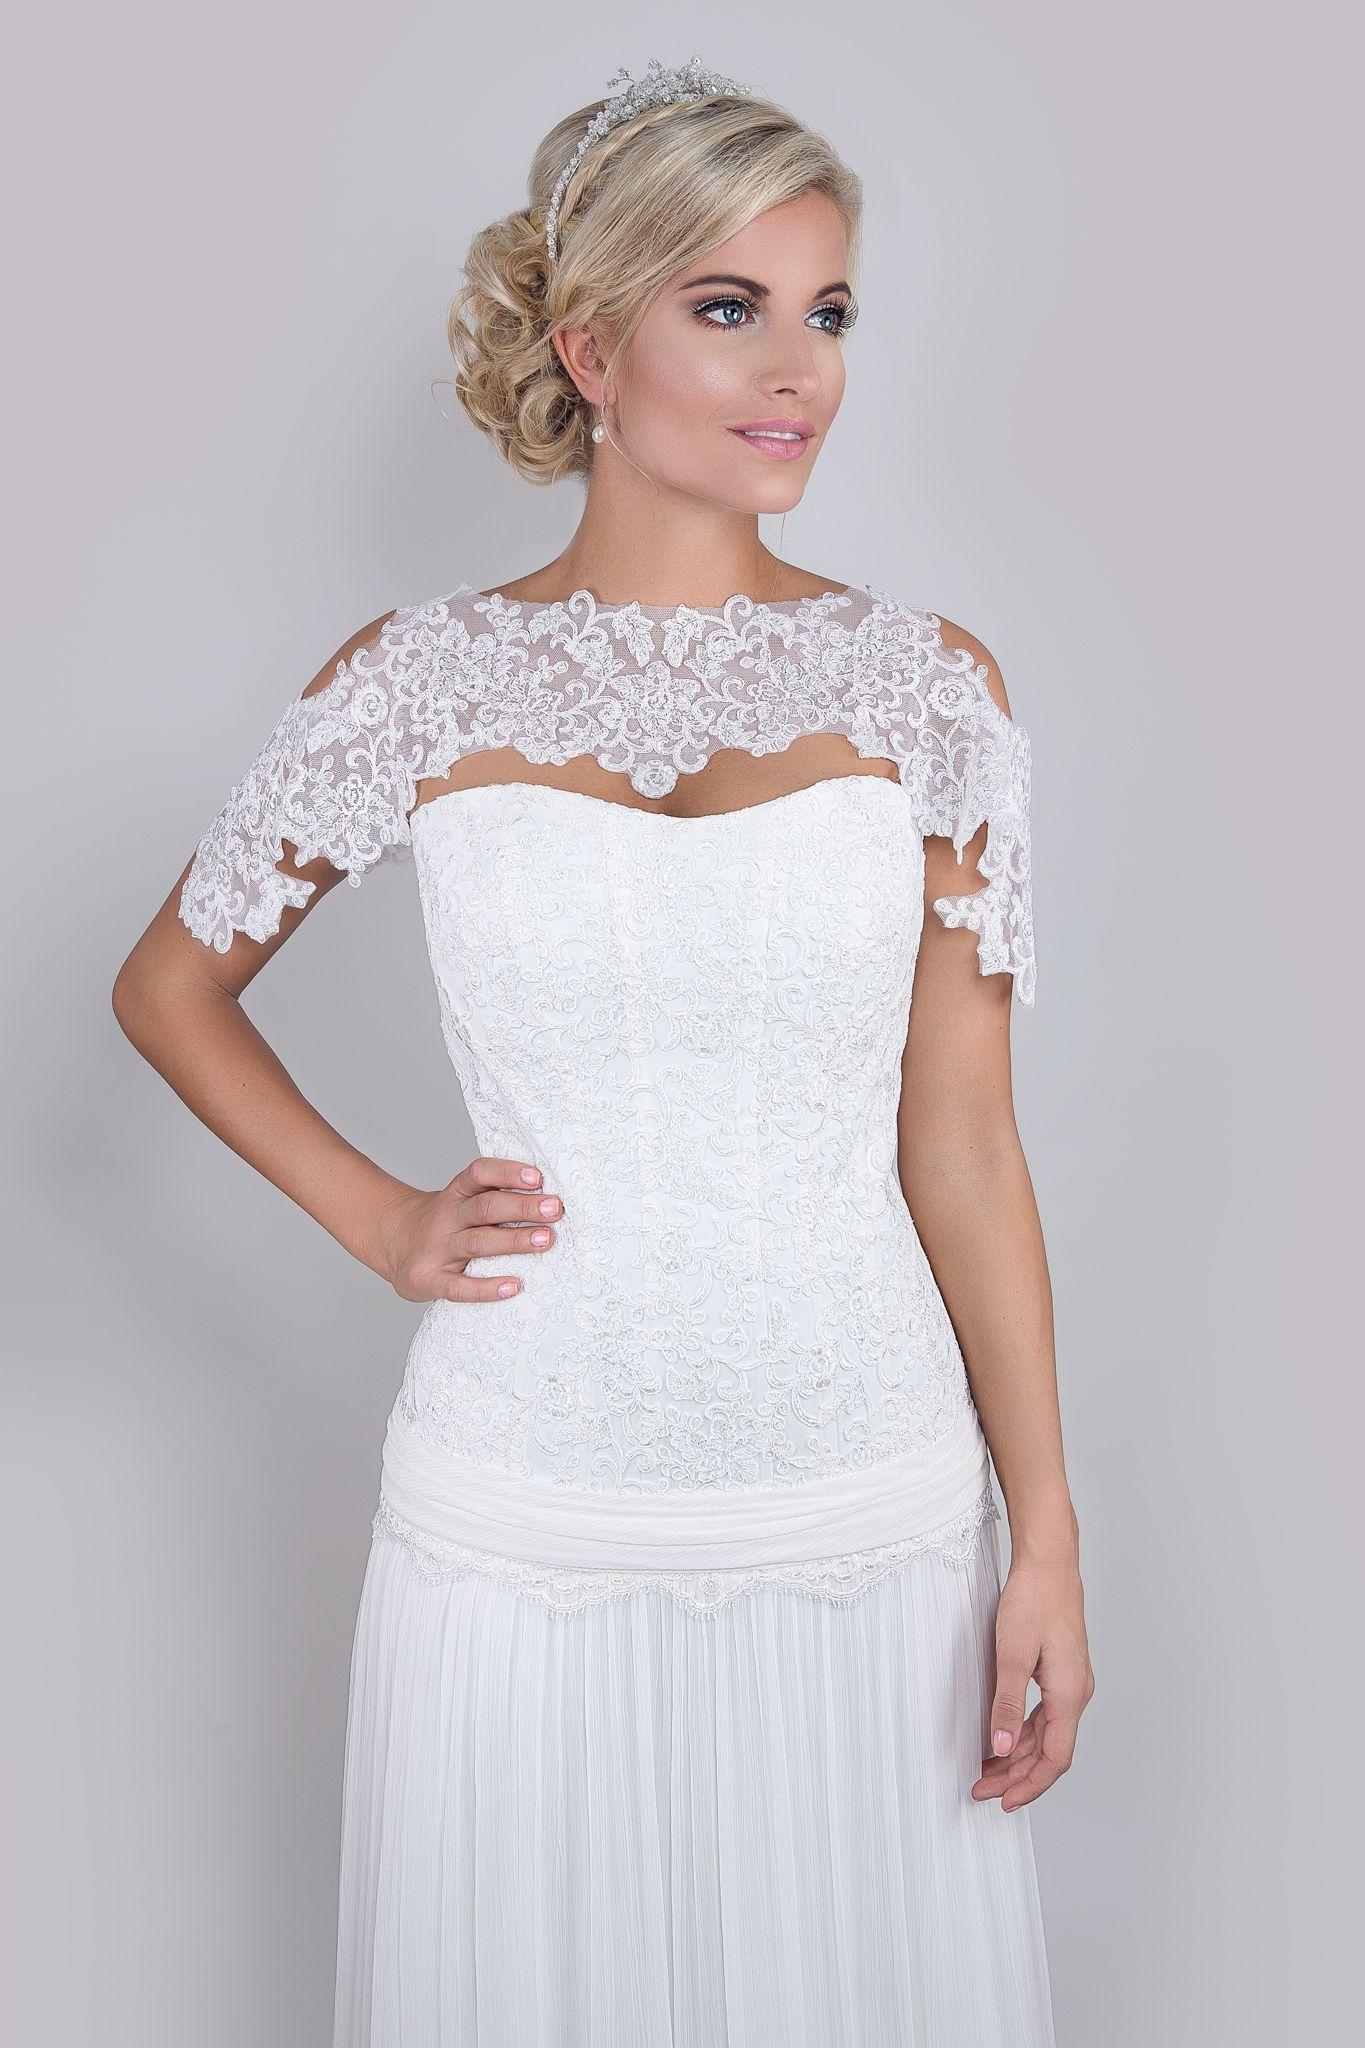 Calypso Haute Couture Brautkleid Alisa 2015 Aufwendig besticktes ...